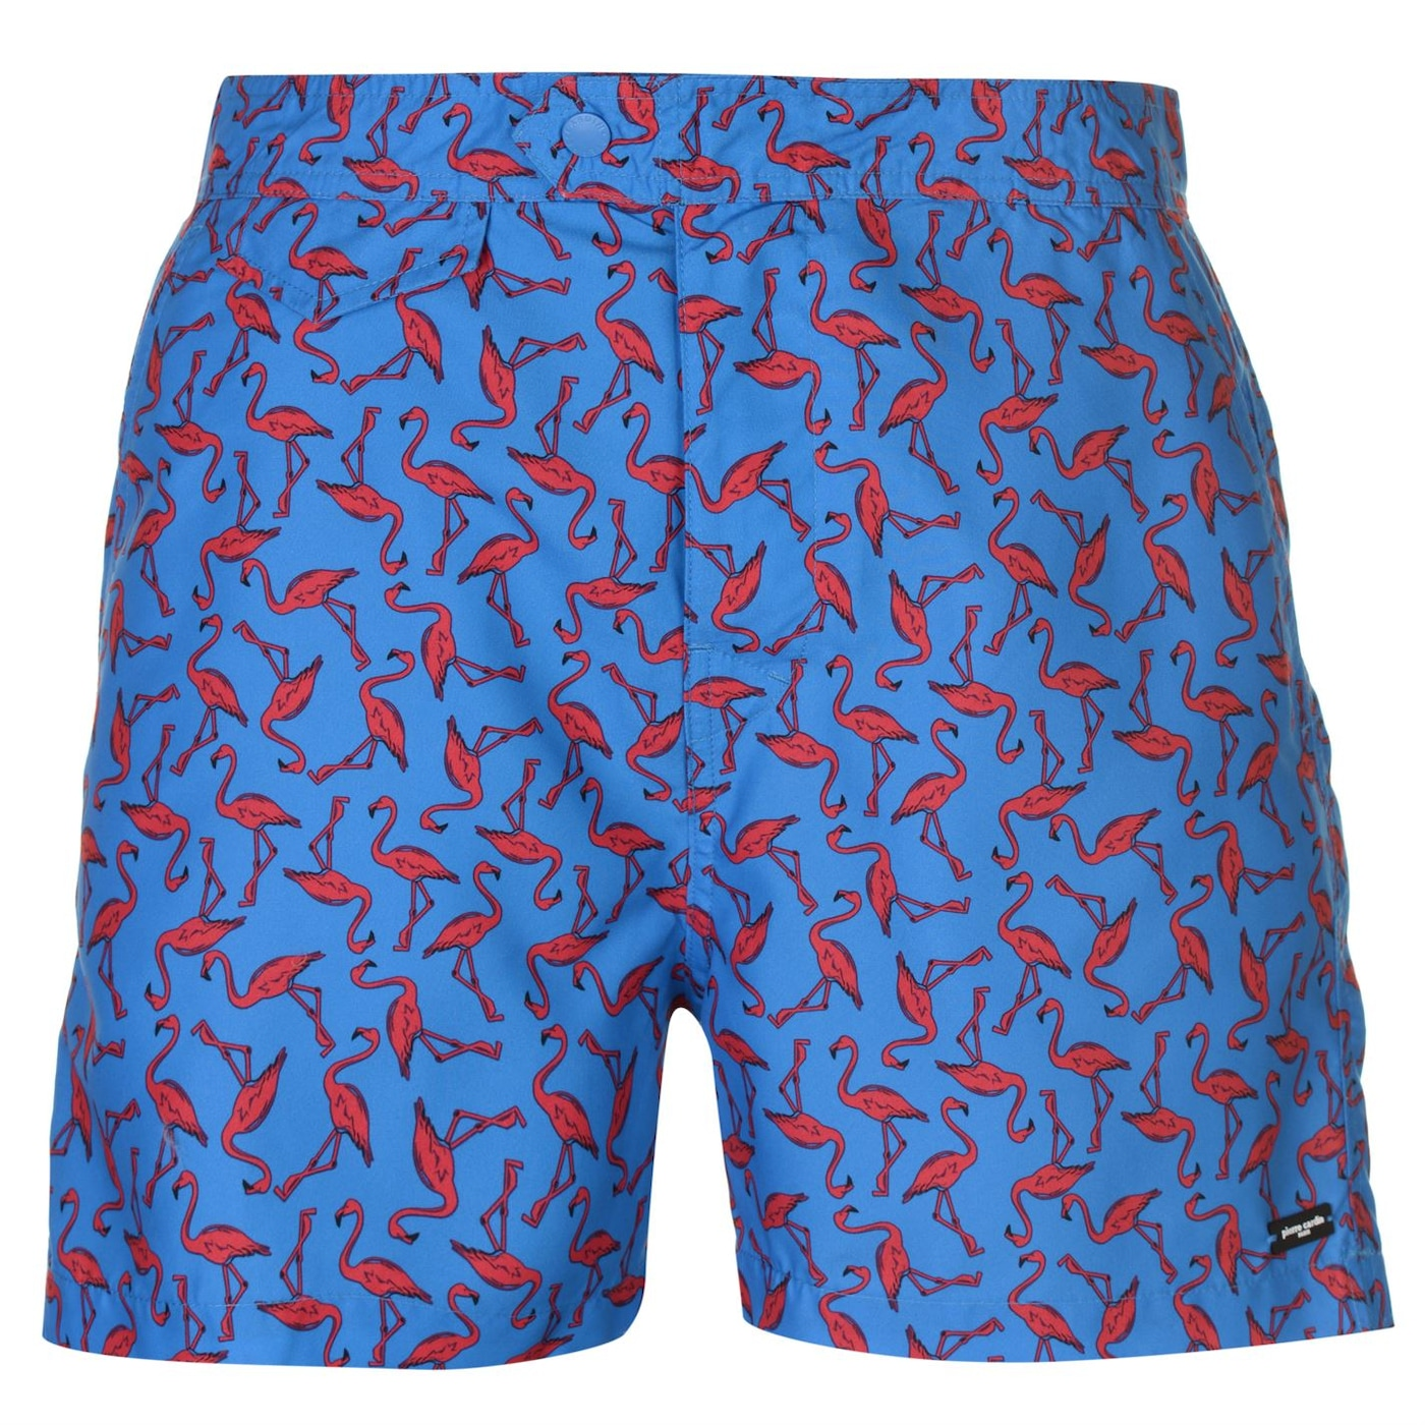 Pierre Cardin Mix Swim Shorts Mens